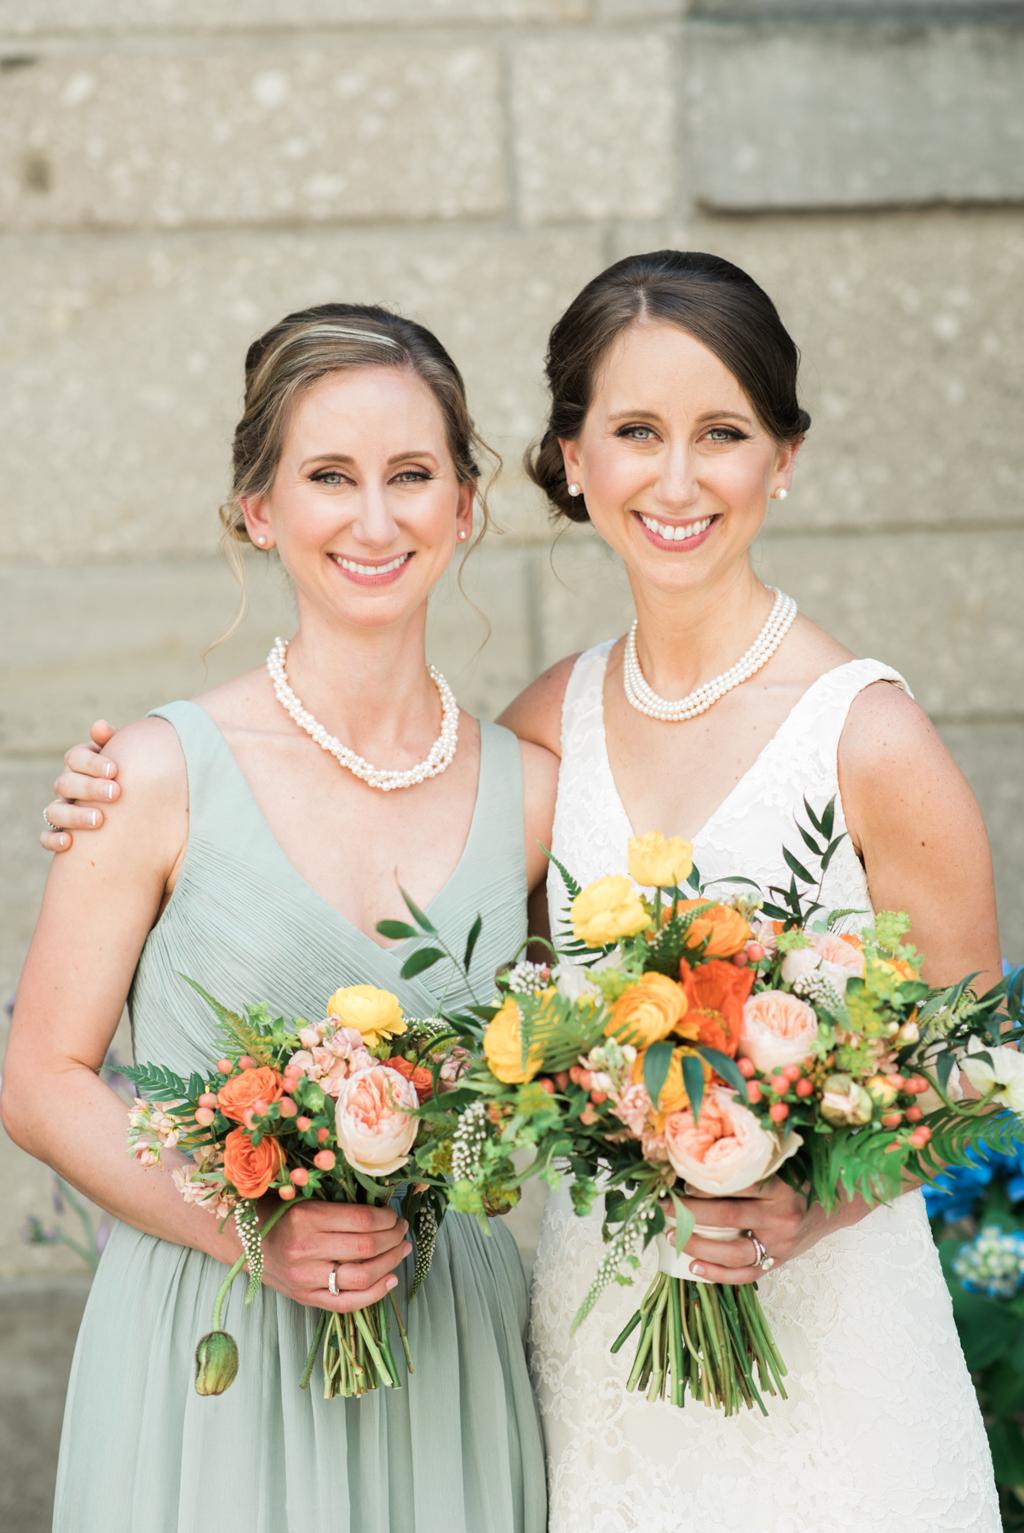 Modern_Coopers_Hall_ Wedding__Lauryn_Kay_Photography-11-2